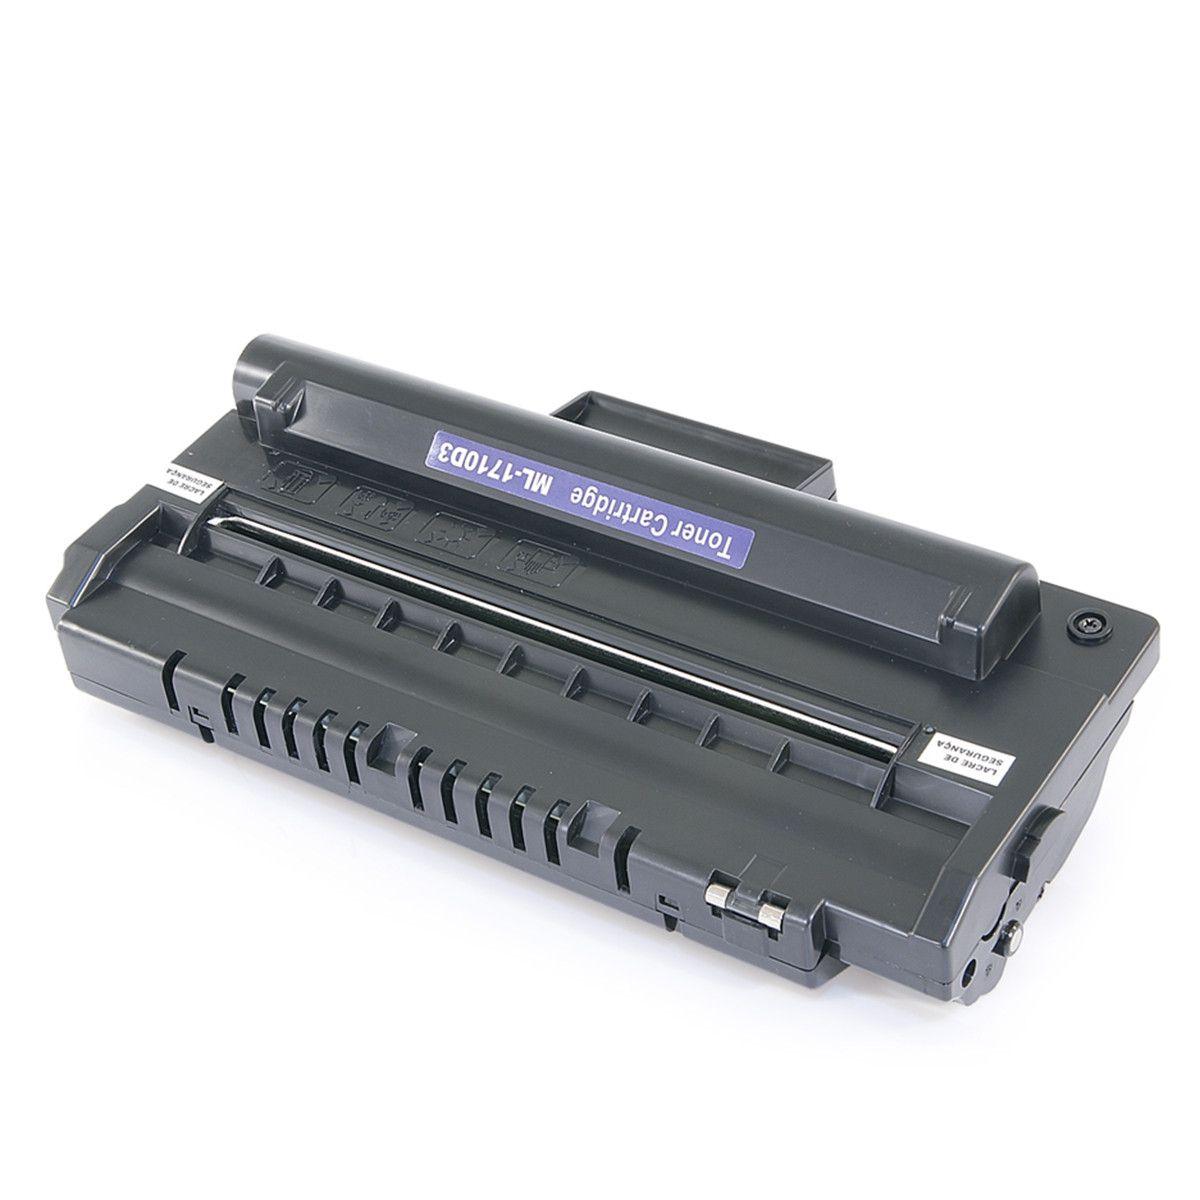 Toner compatível SAMSUNG ML1710D3   ML1410 ML1500 ML1510 ML1710 ML1750 ML1755 - 3.000 Páginas - Cartucho & Cia